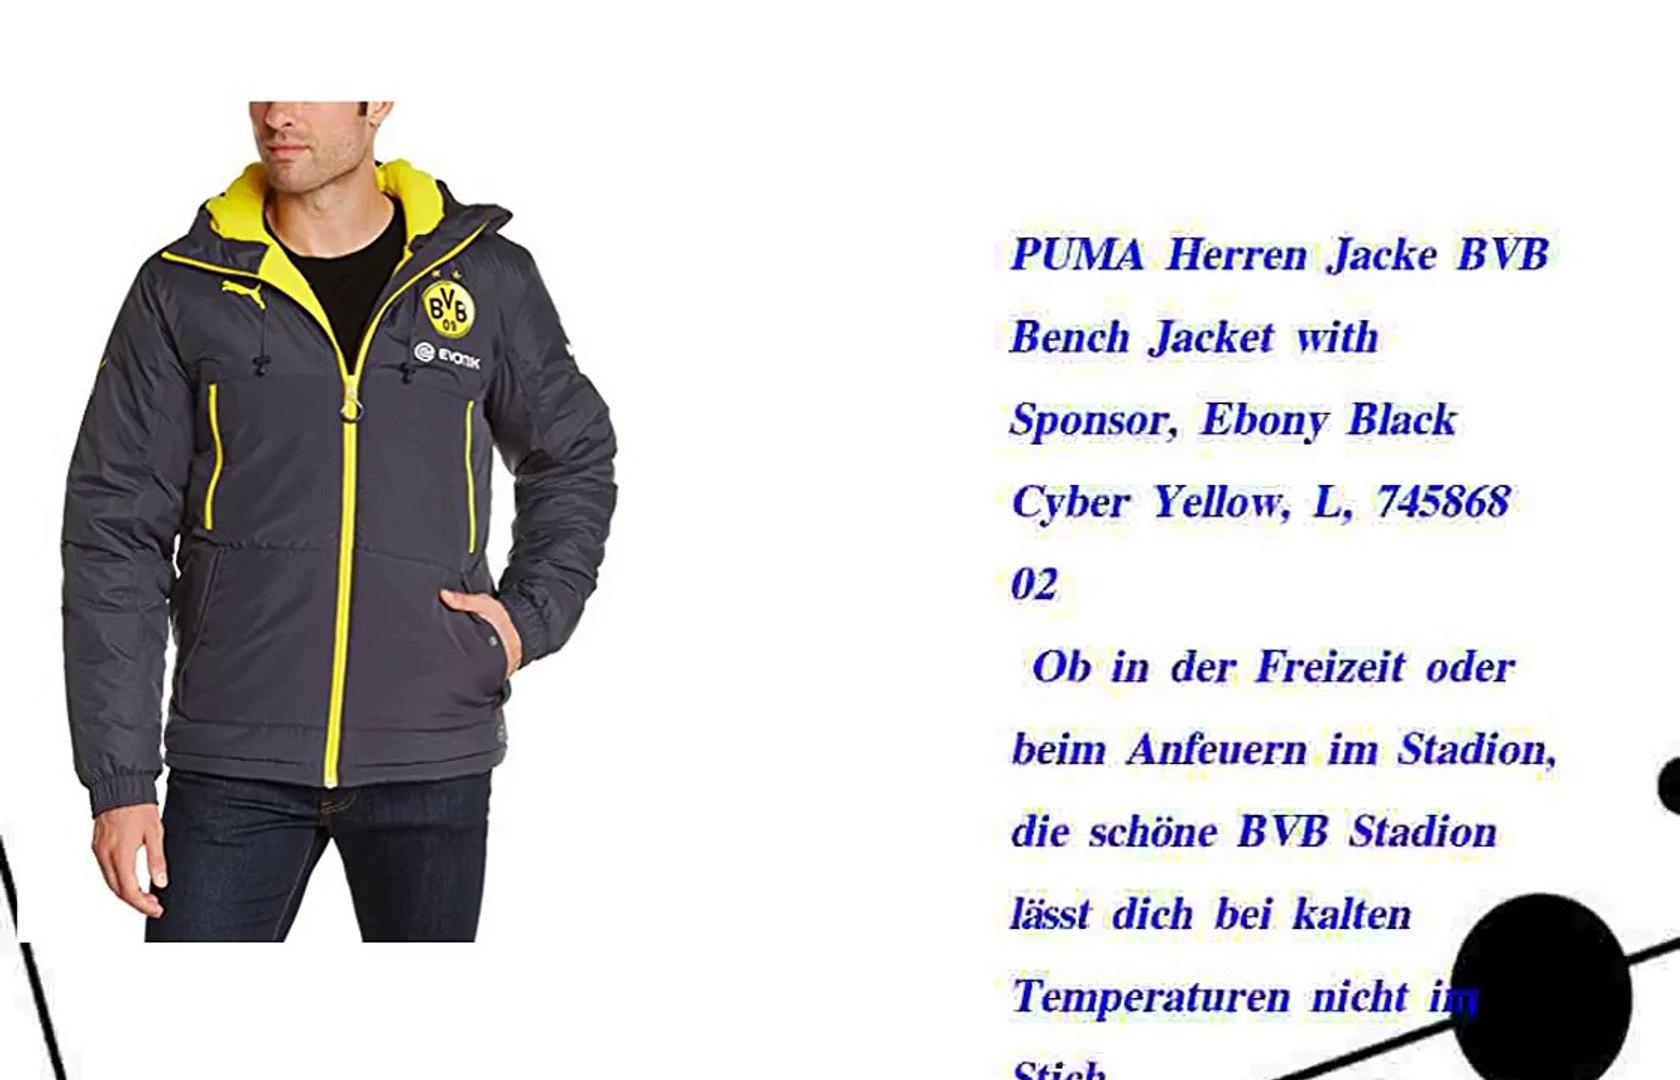 PUMA Herren Jacke BVB Bench